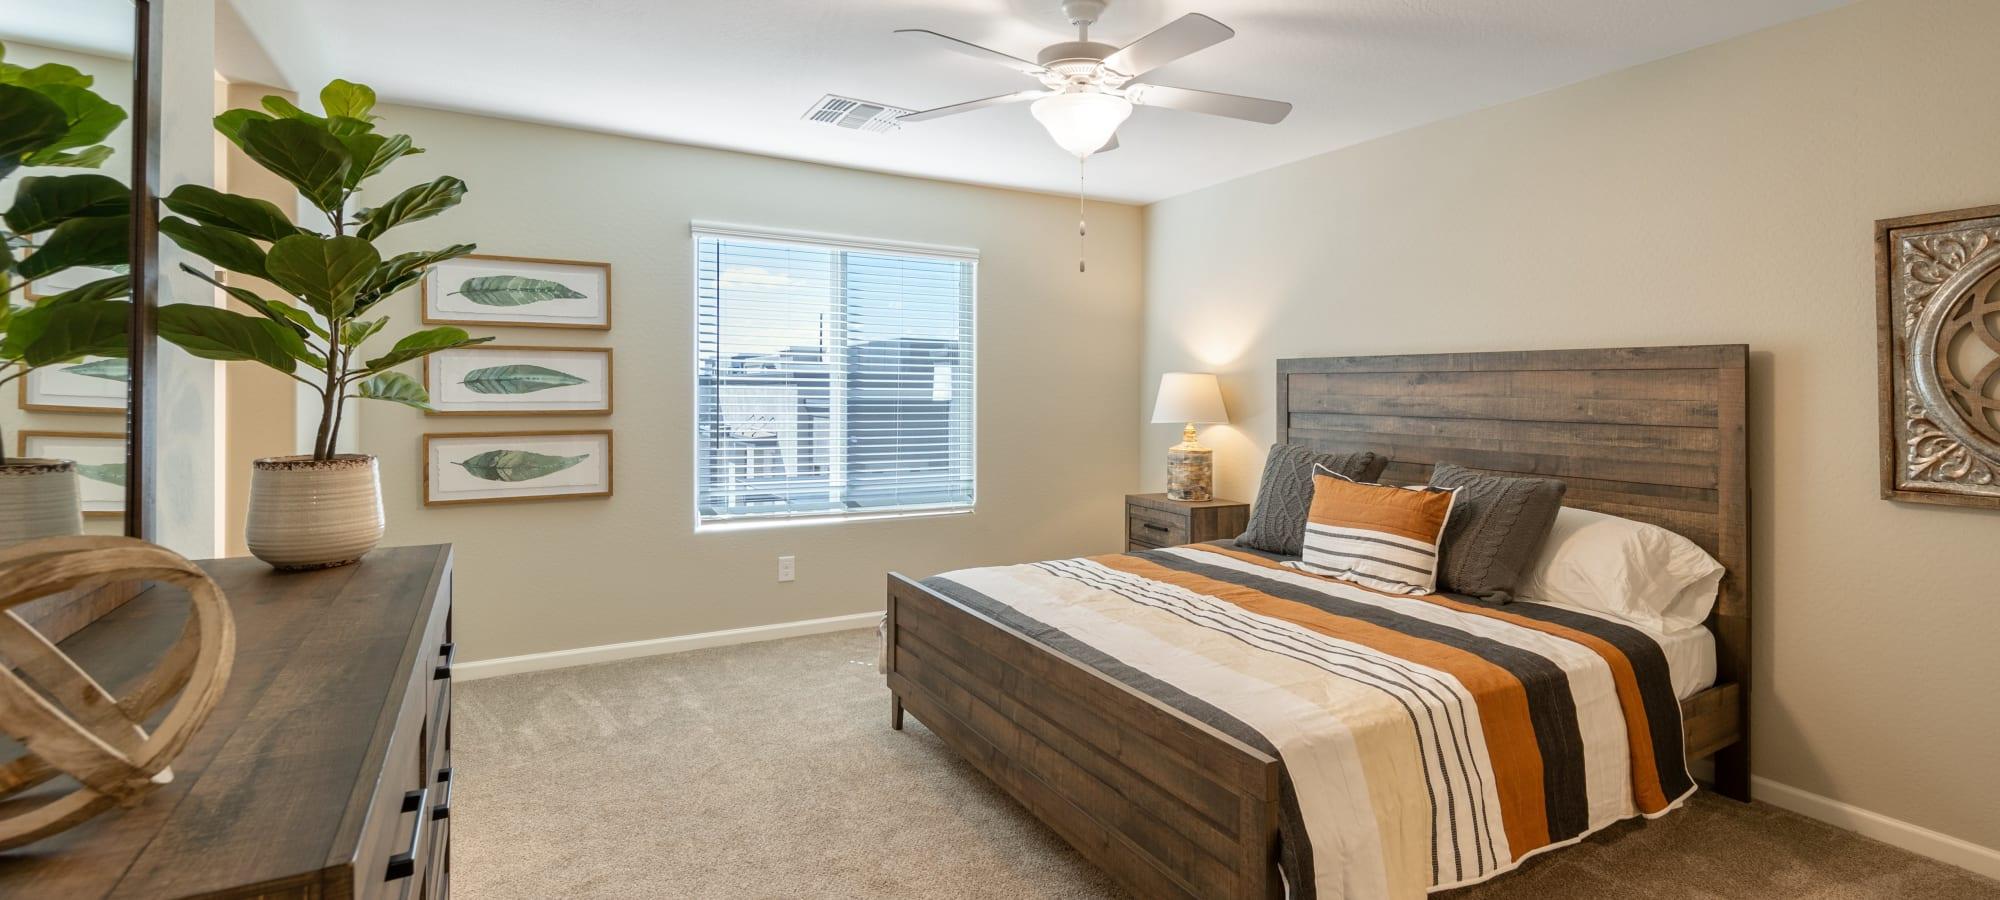 Master Bedroom at BB Living at Val Vista in Gilbert, Arizona